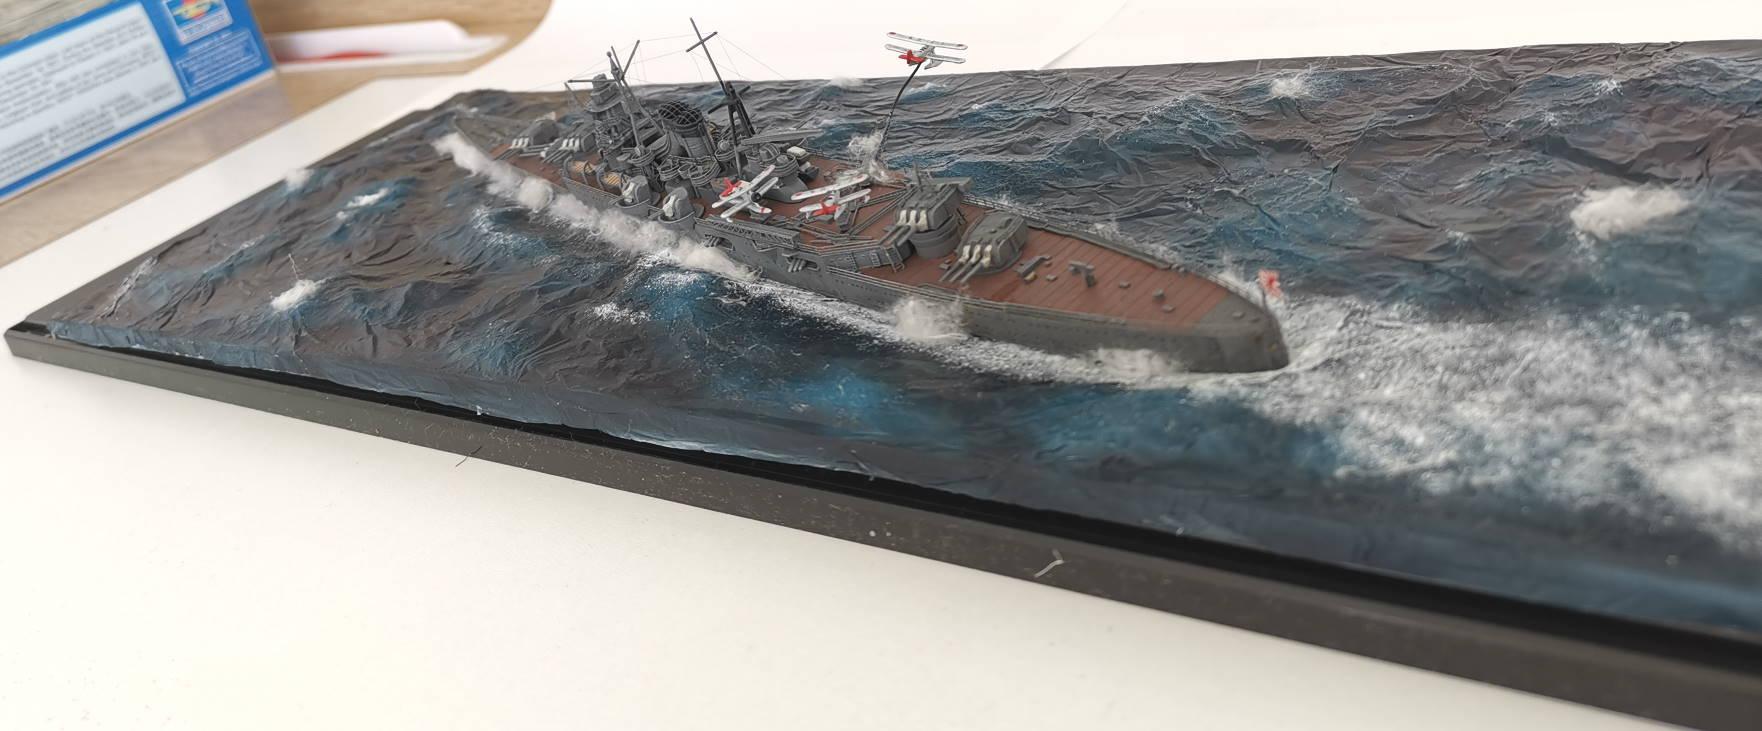 Croiseur léger Mogami Tamiya 1/700e, avec photodec Artist Hobby  Mogami27